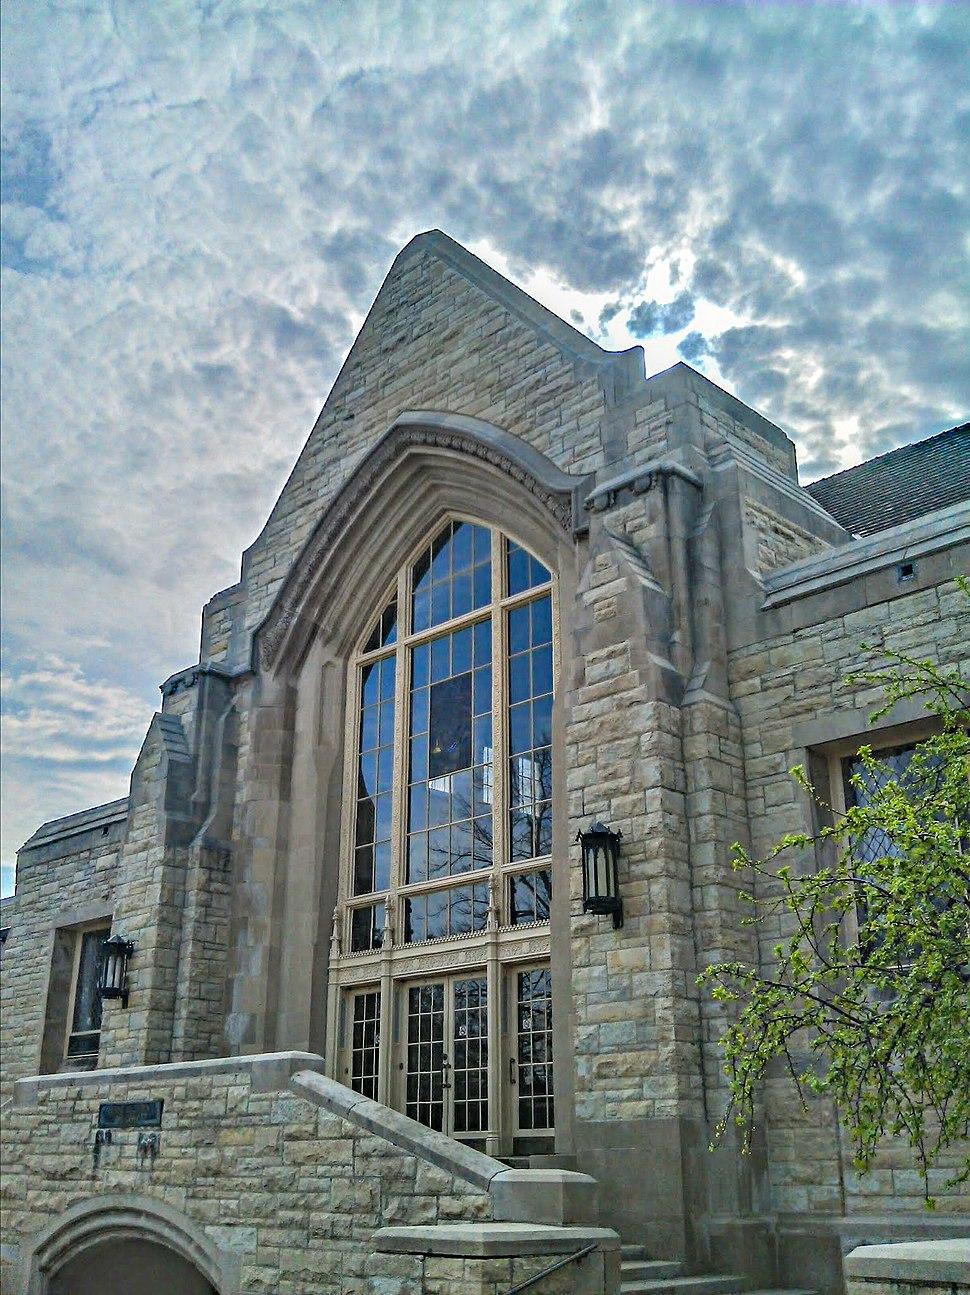 Northern Illinois University, College of Law, Swen Parson Hall